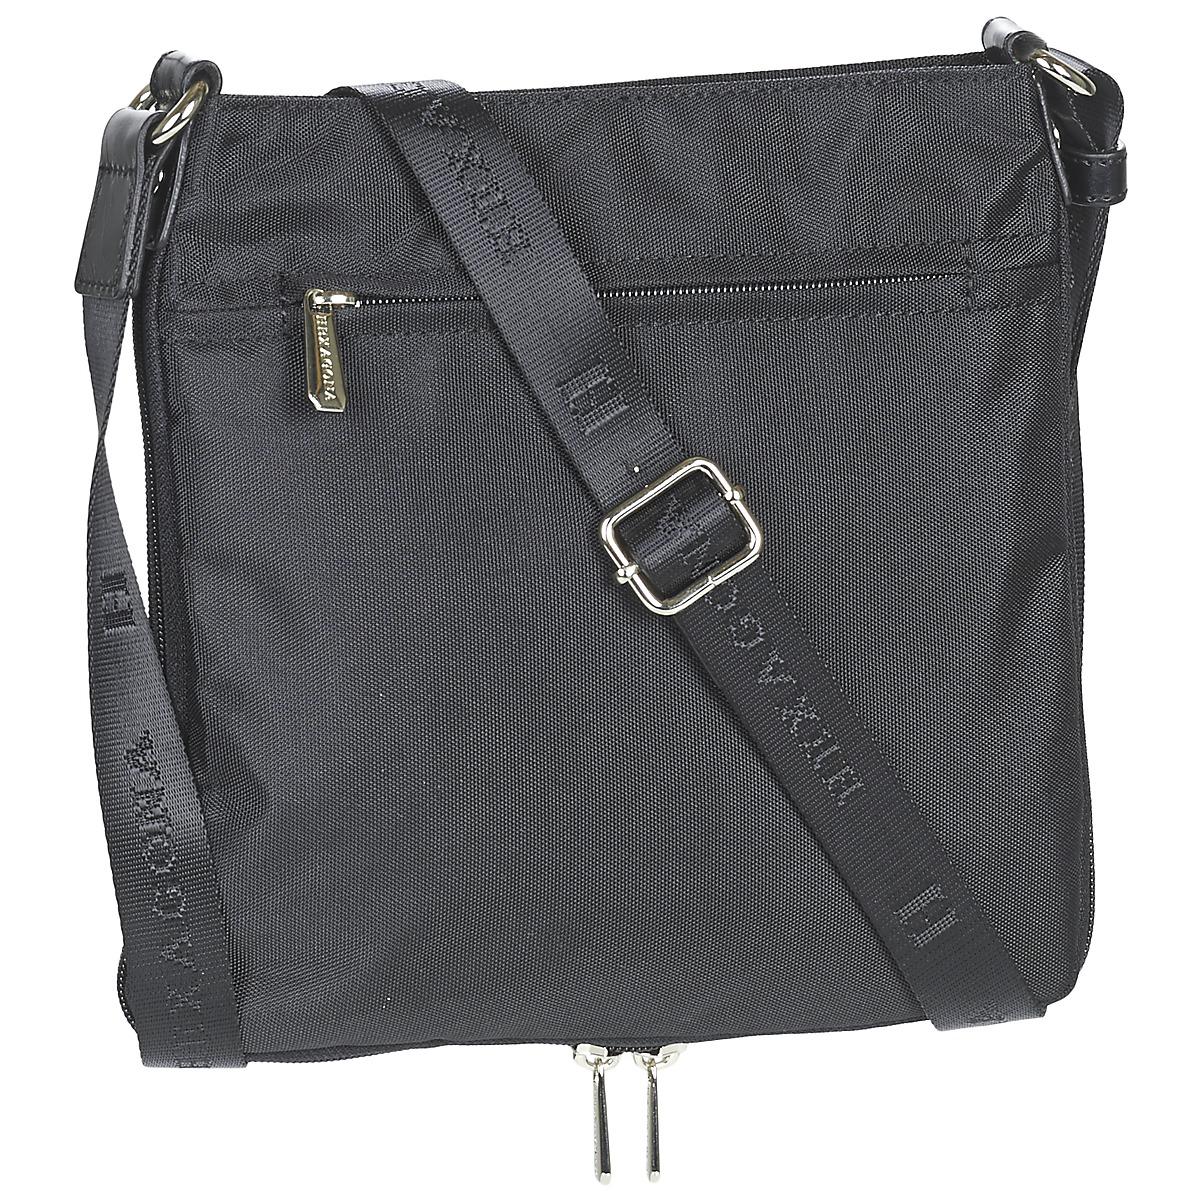 Borse 31130 Prada Saffiano Cuir Tote Bag BN2820 Bianco